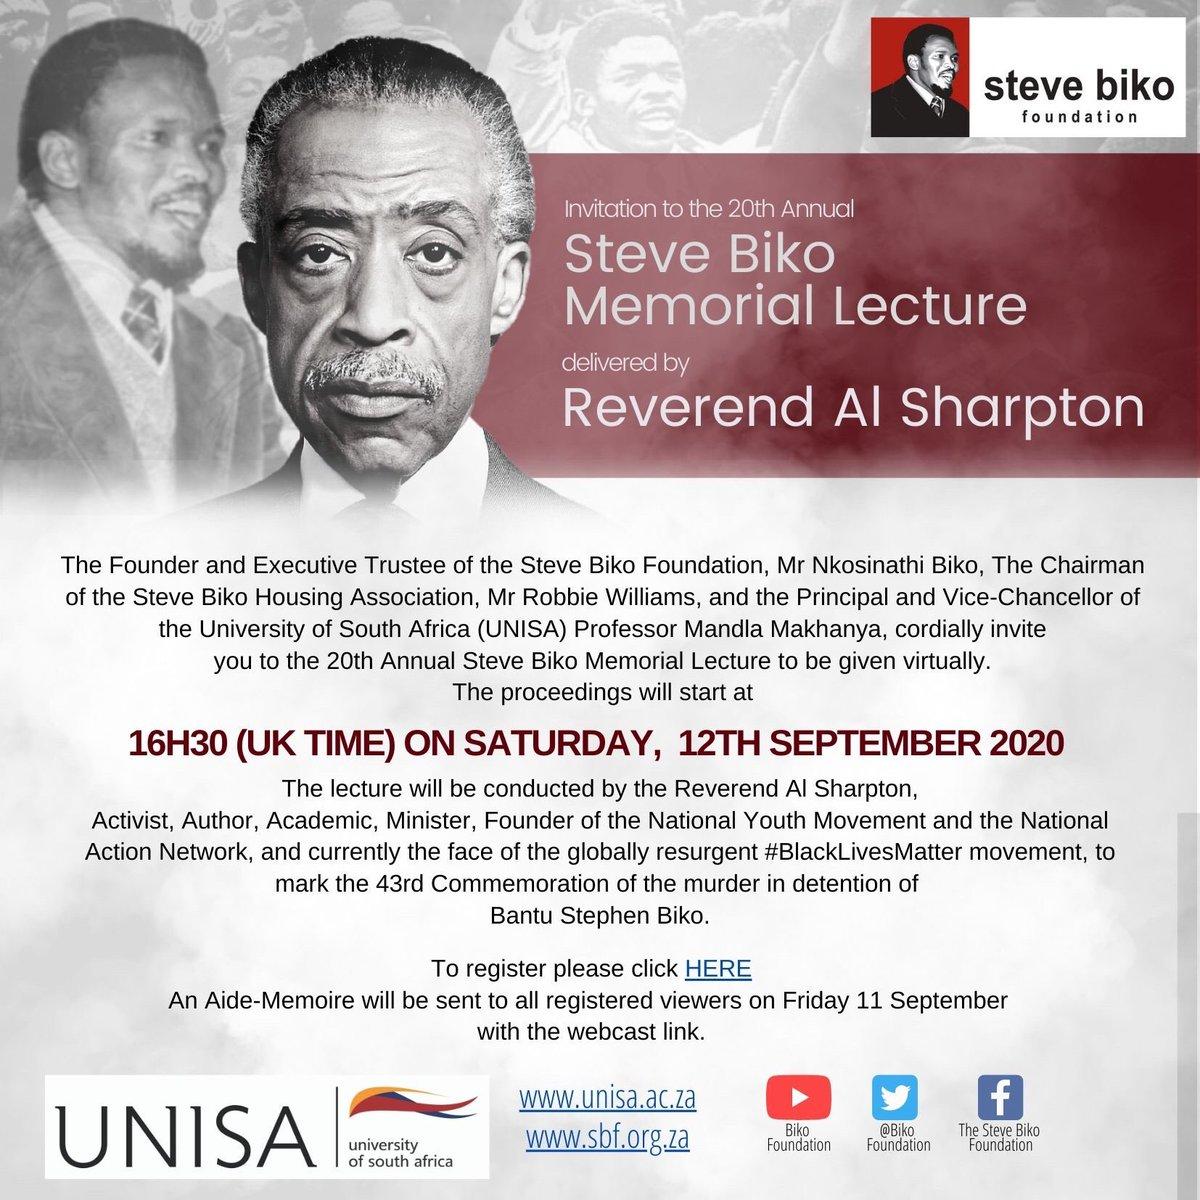 Steve Biko HA